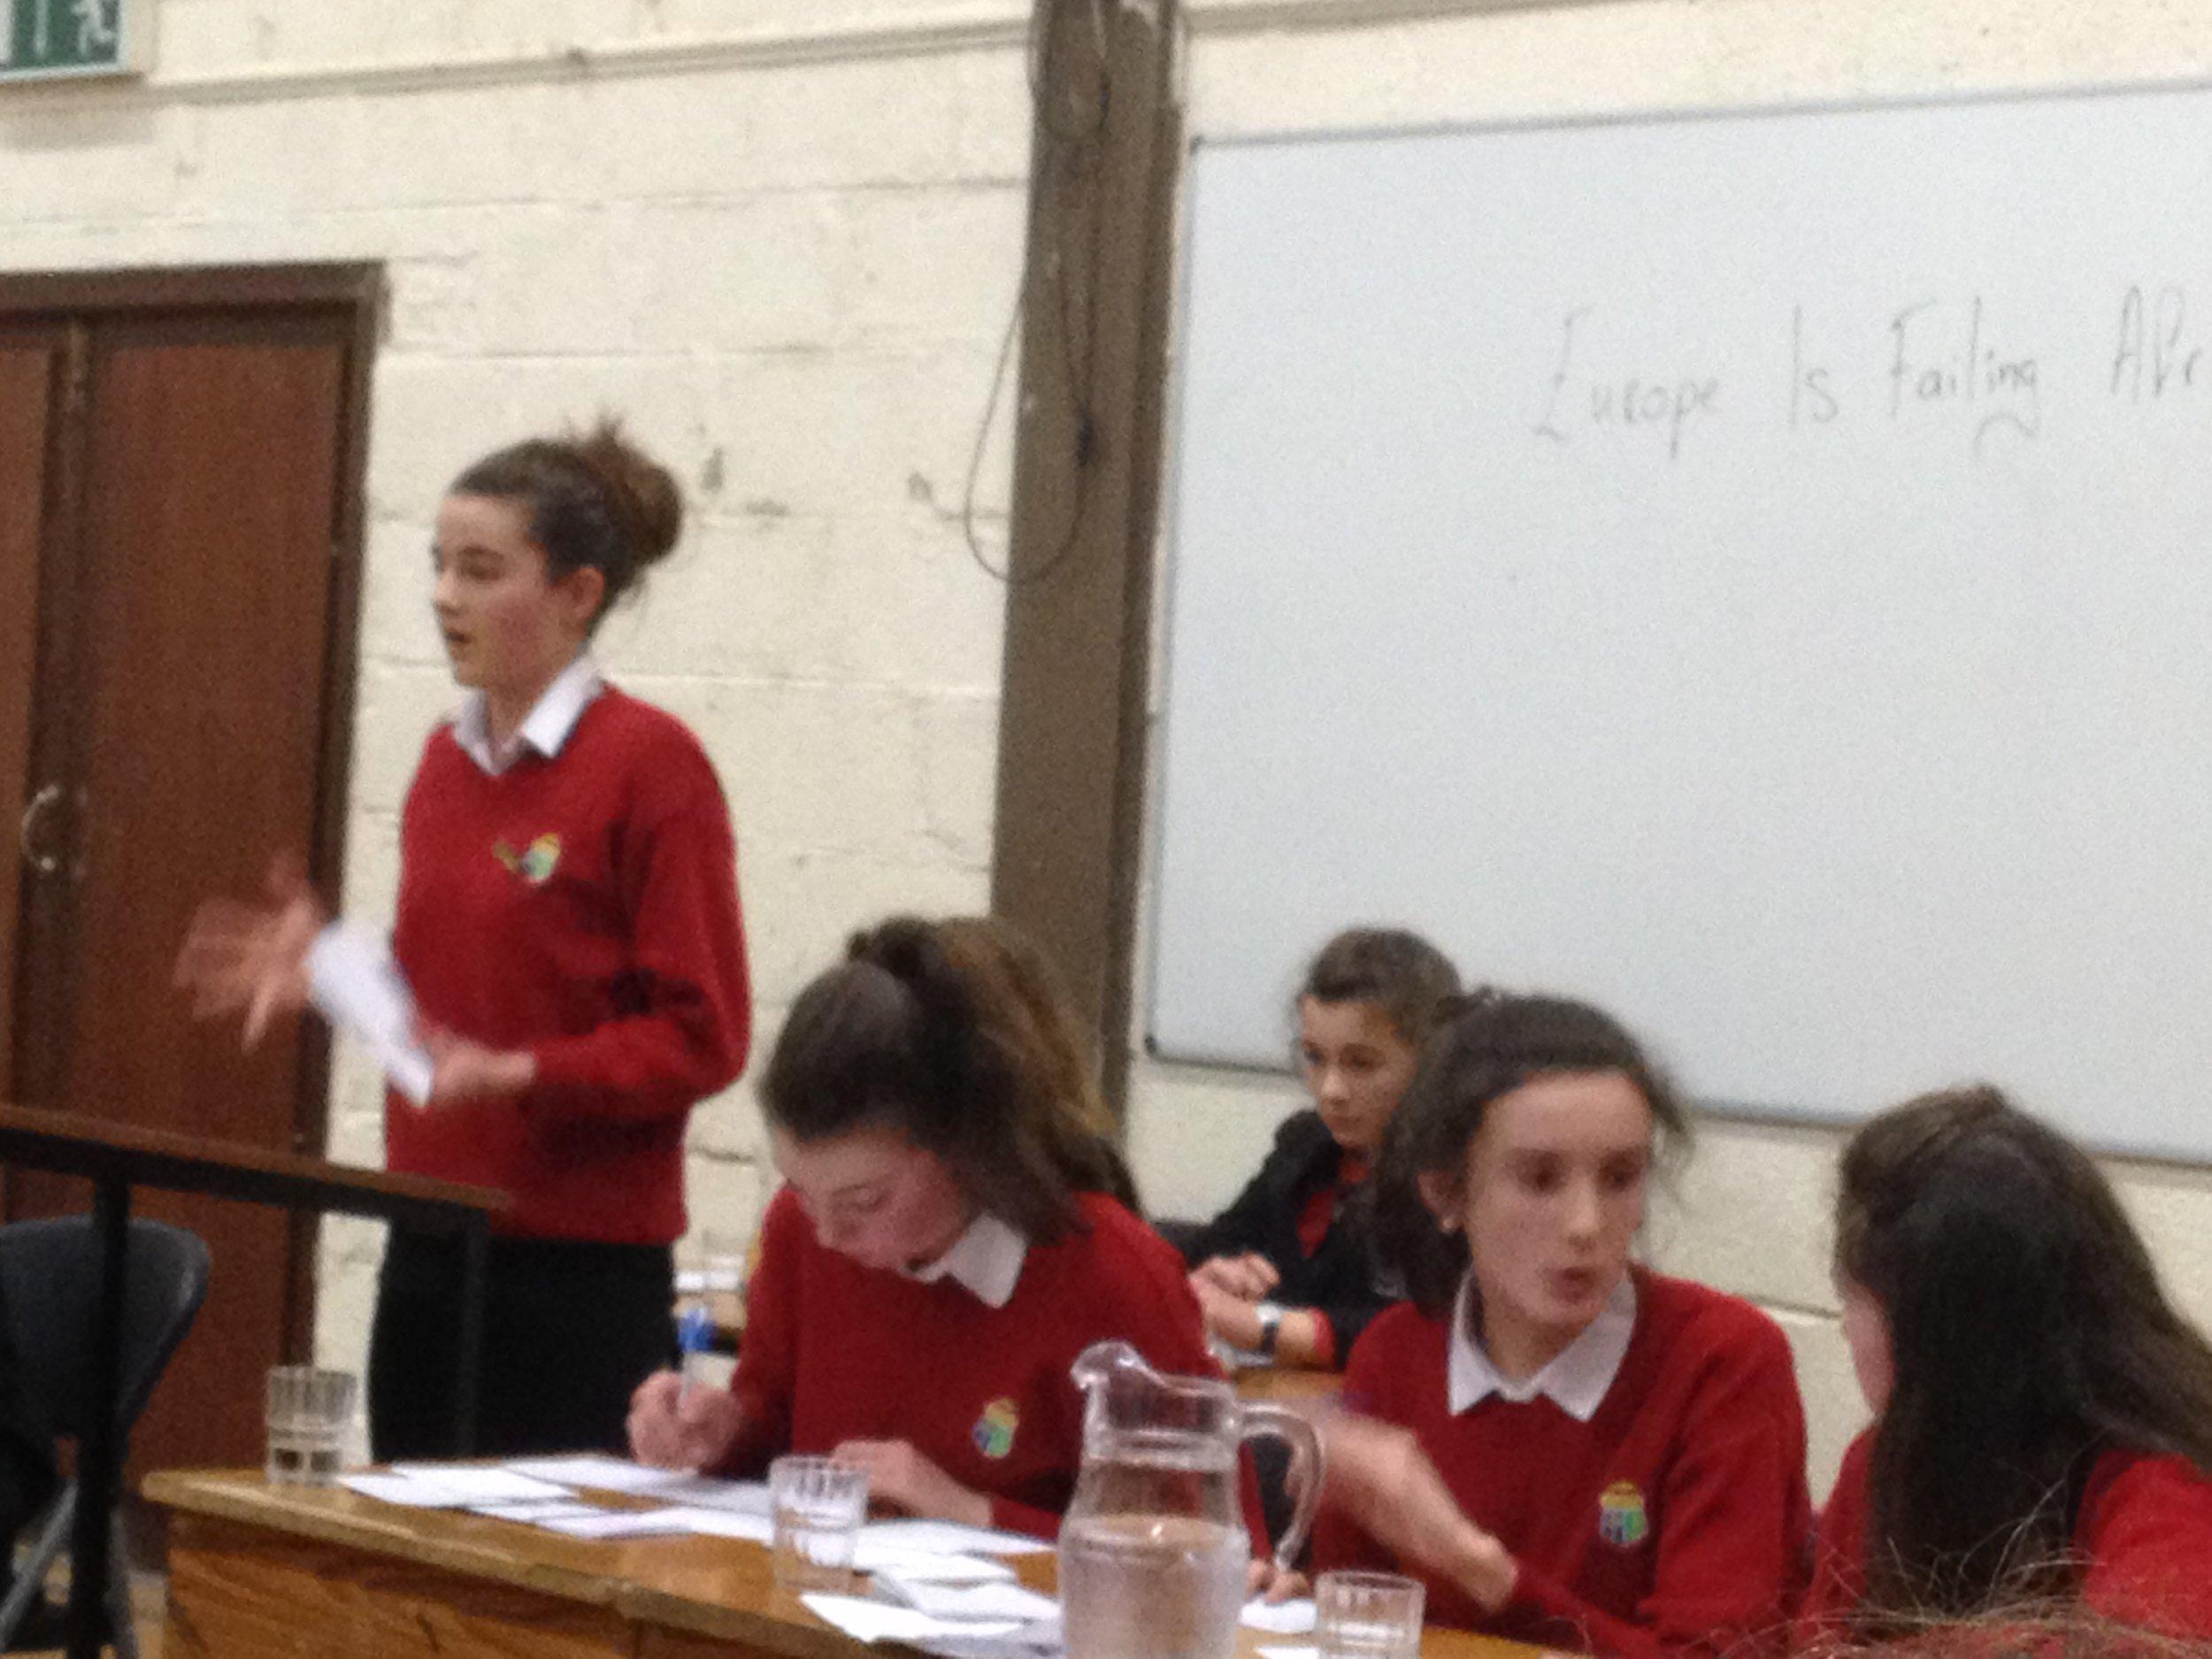 Debating and Public Speaking